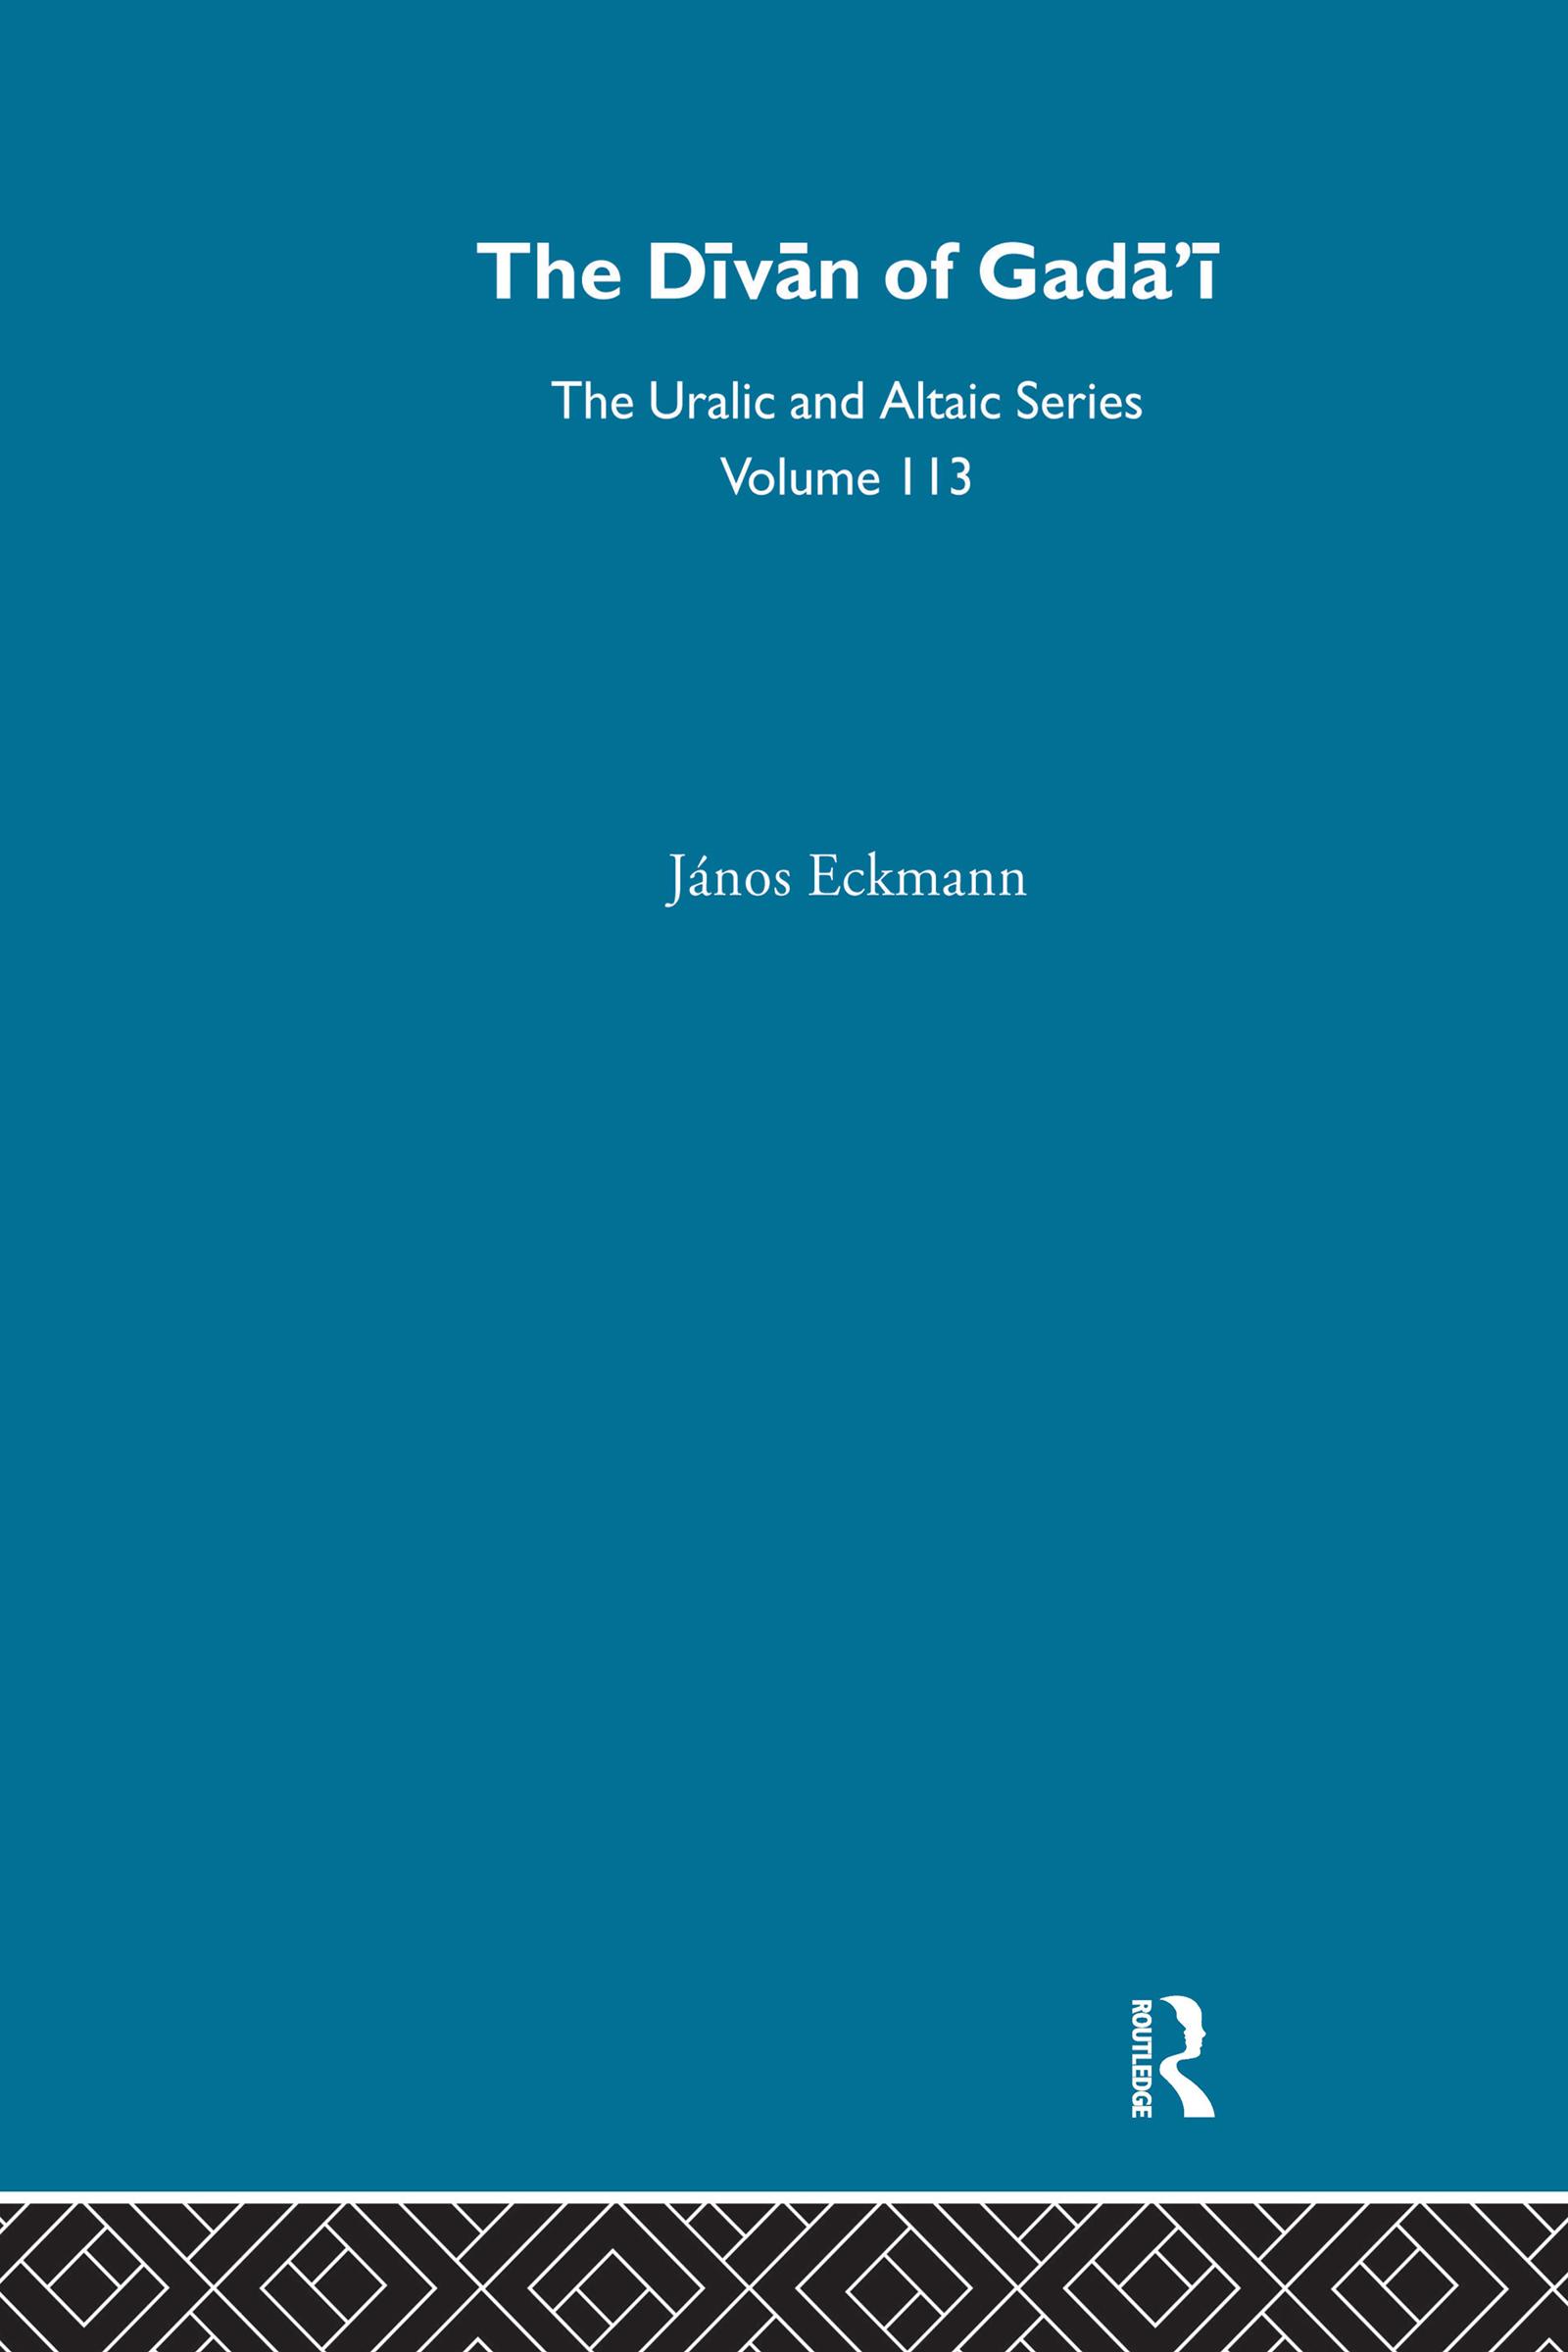 The Divan of Gadai: 1st Edition (Hardback) book cover